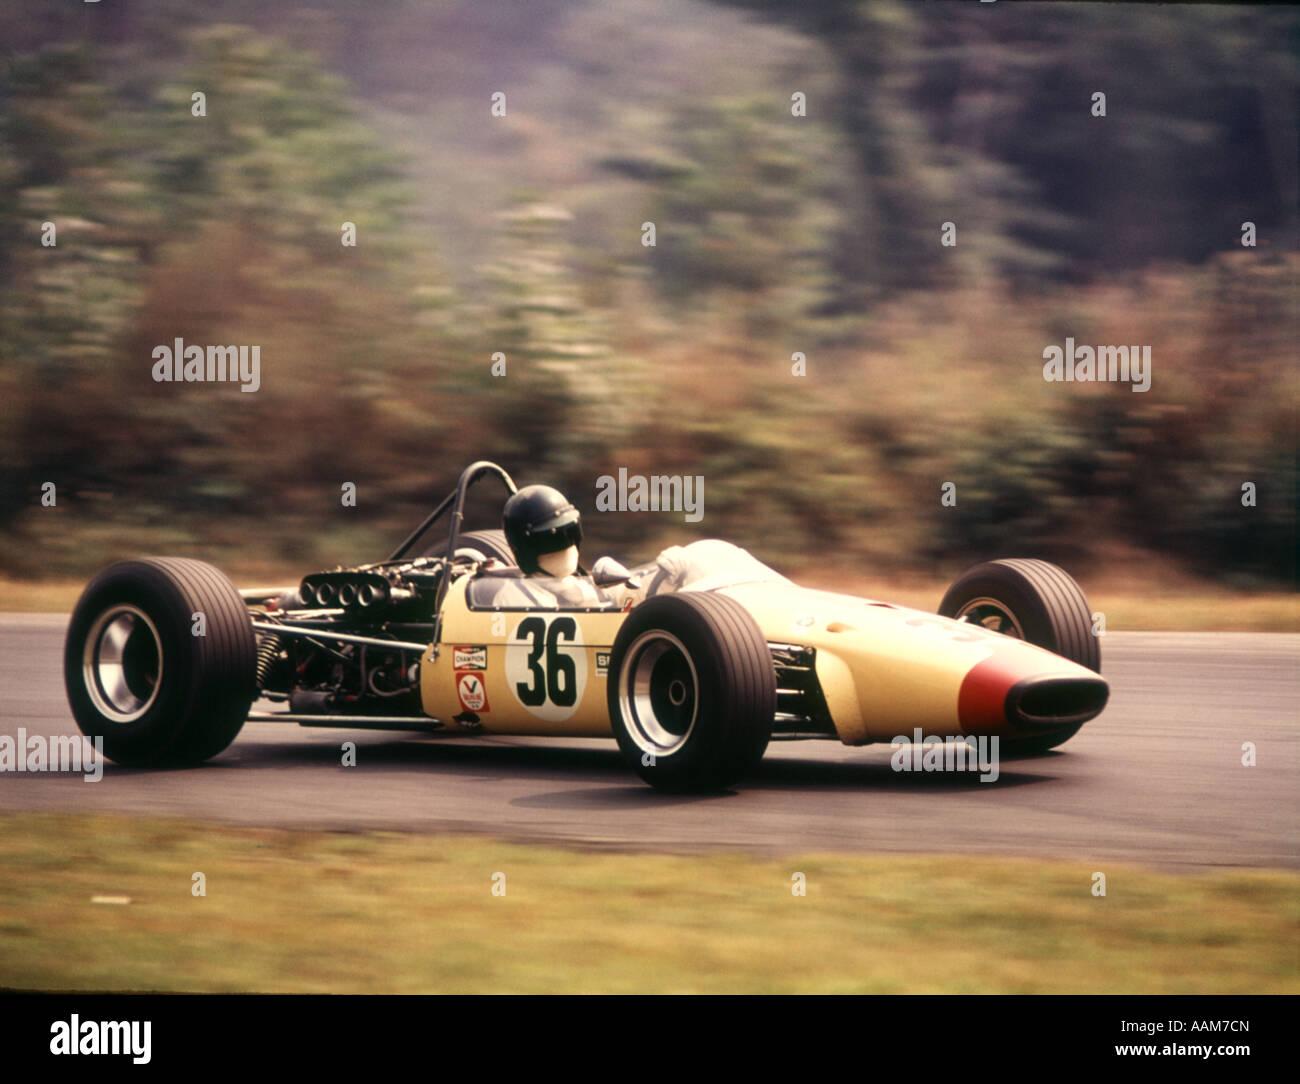 Car Stock Photos: 1970s Sports Car Stock Photos & 1970s Sports Car Stock